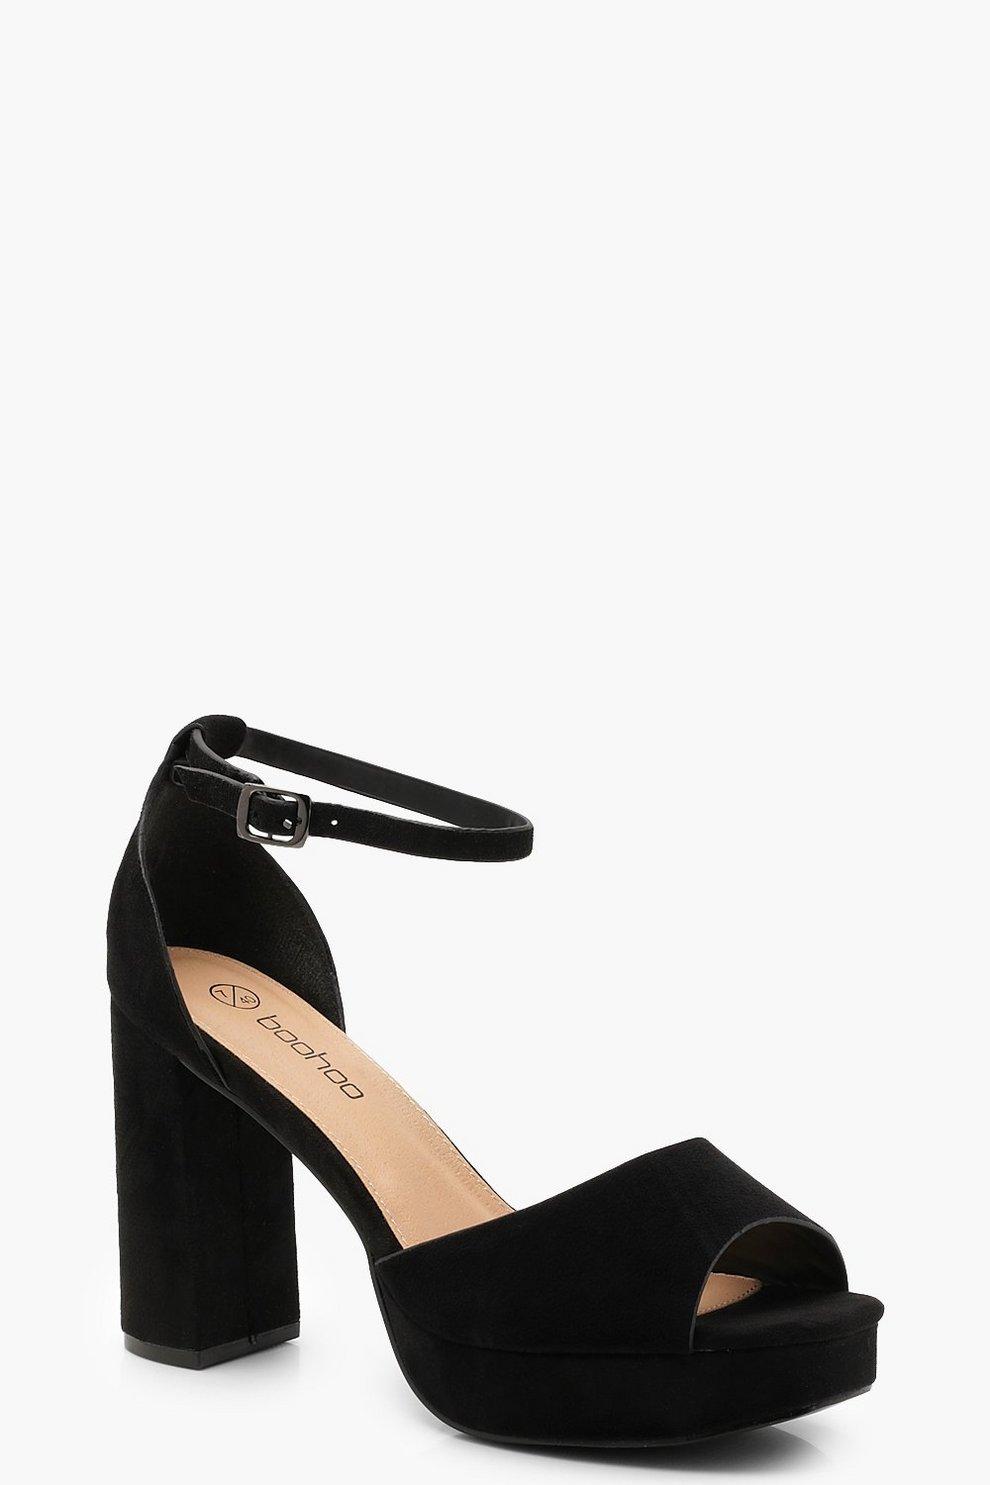 dd50295d35 Wide Fit Peeptoe Platform Heels | Boohoo